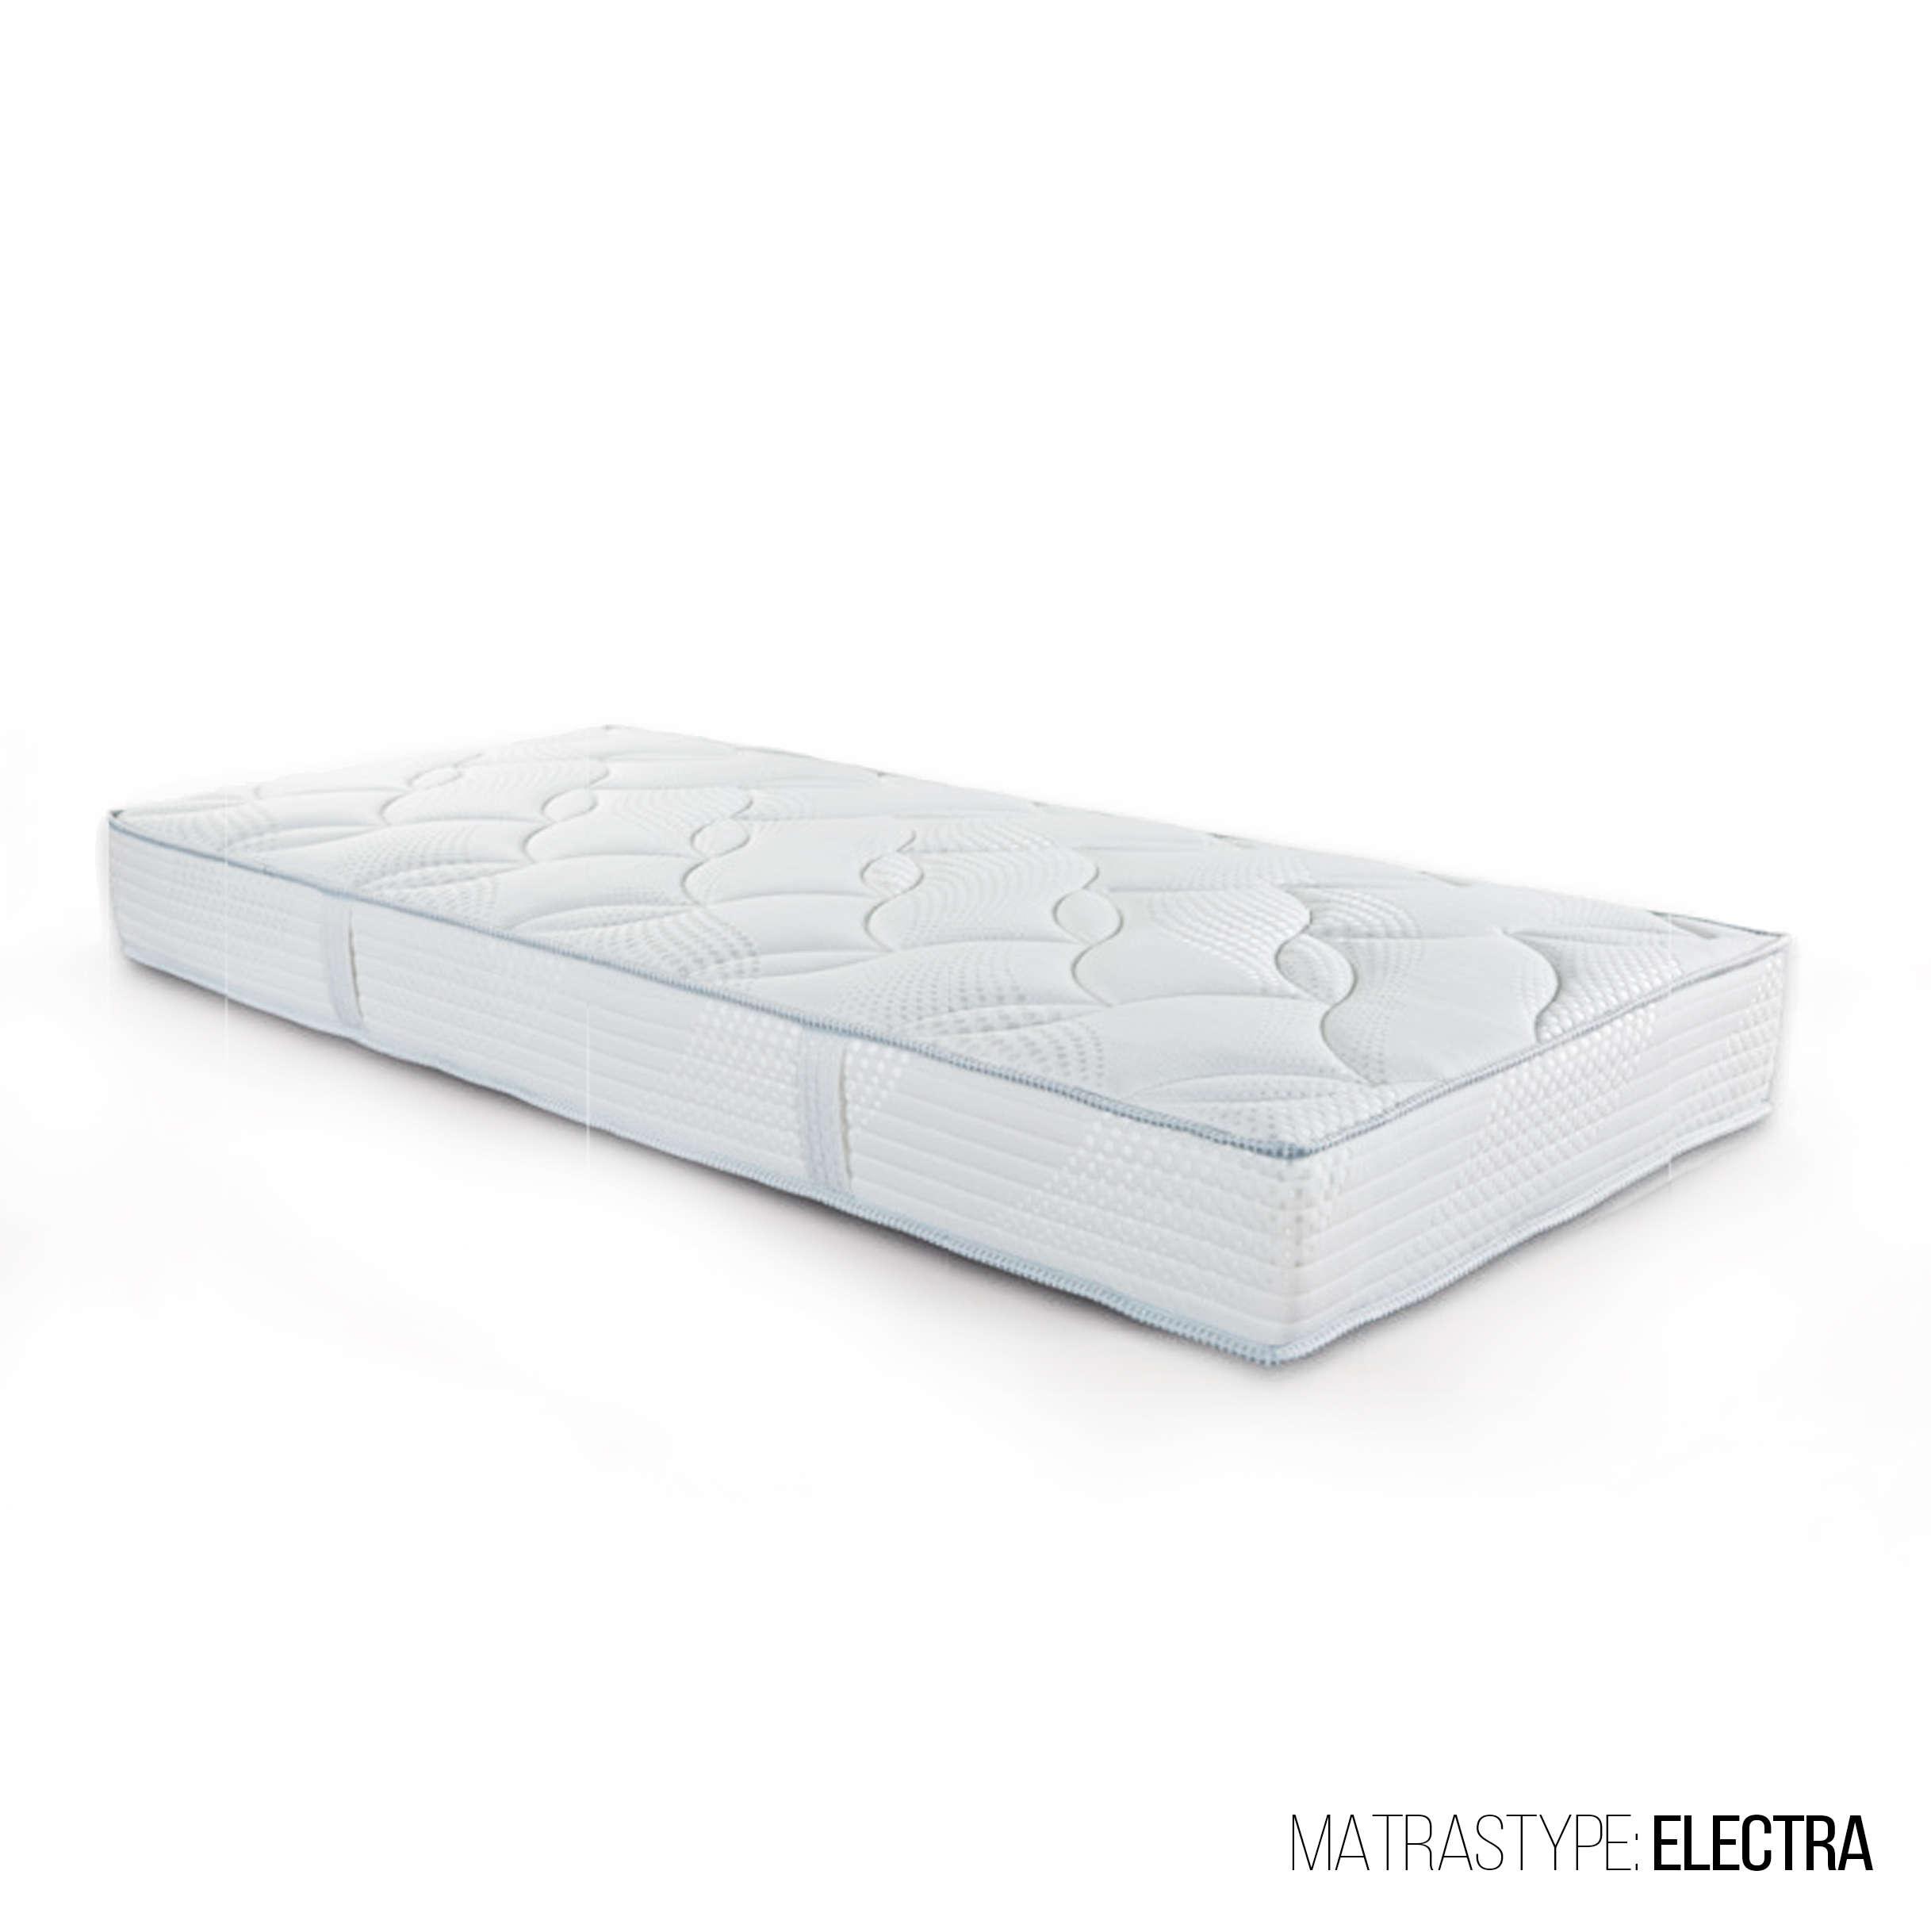 Electra Merlanduo Matras